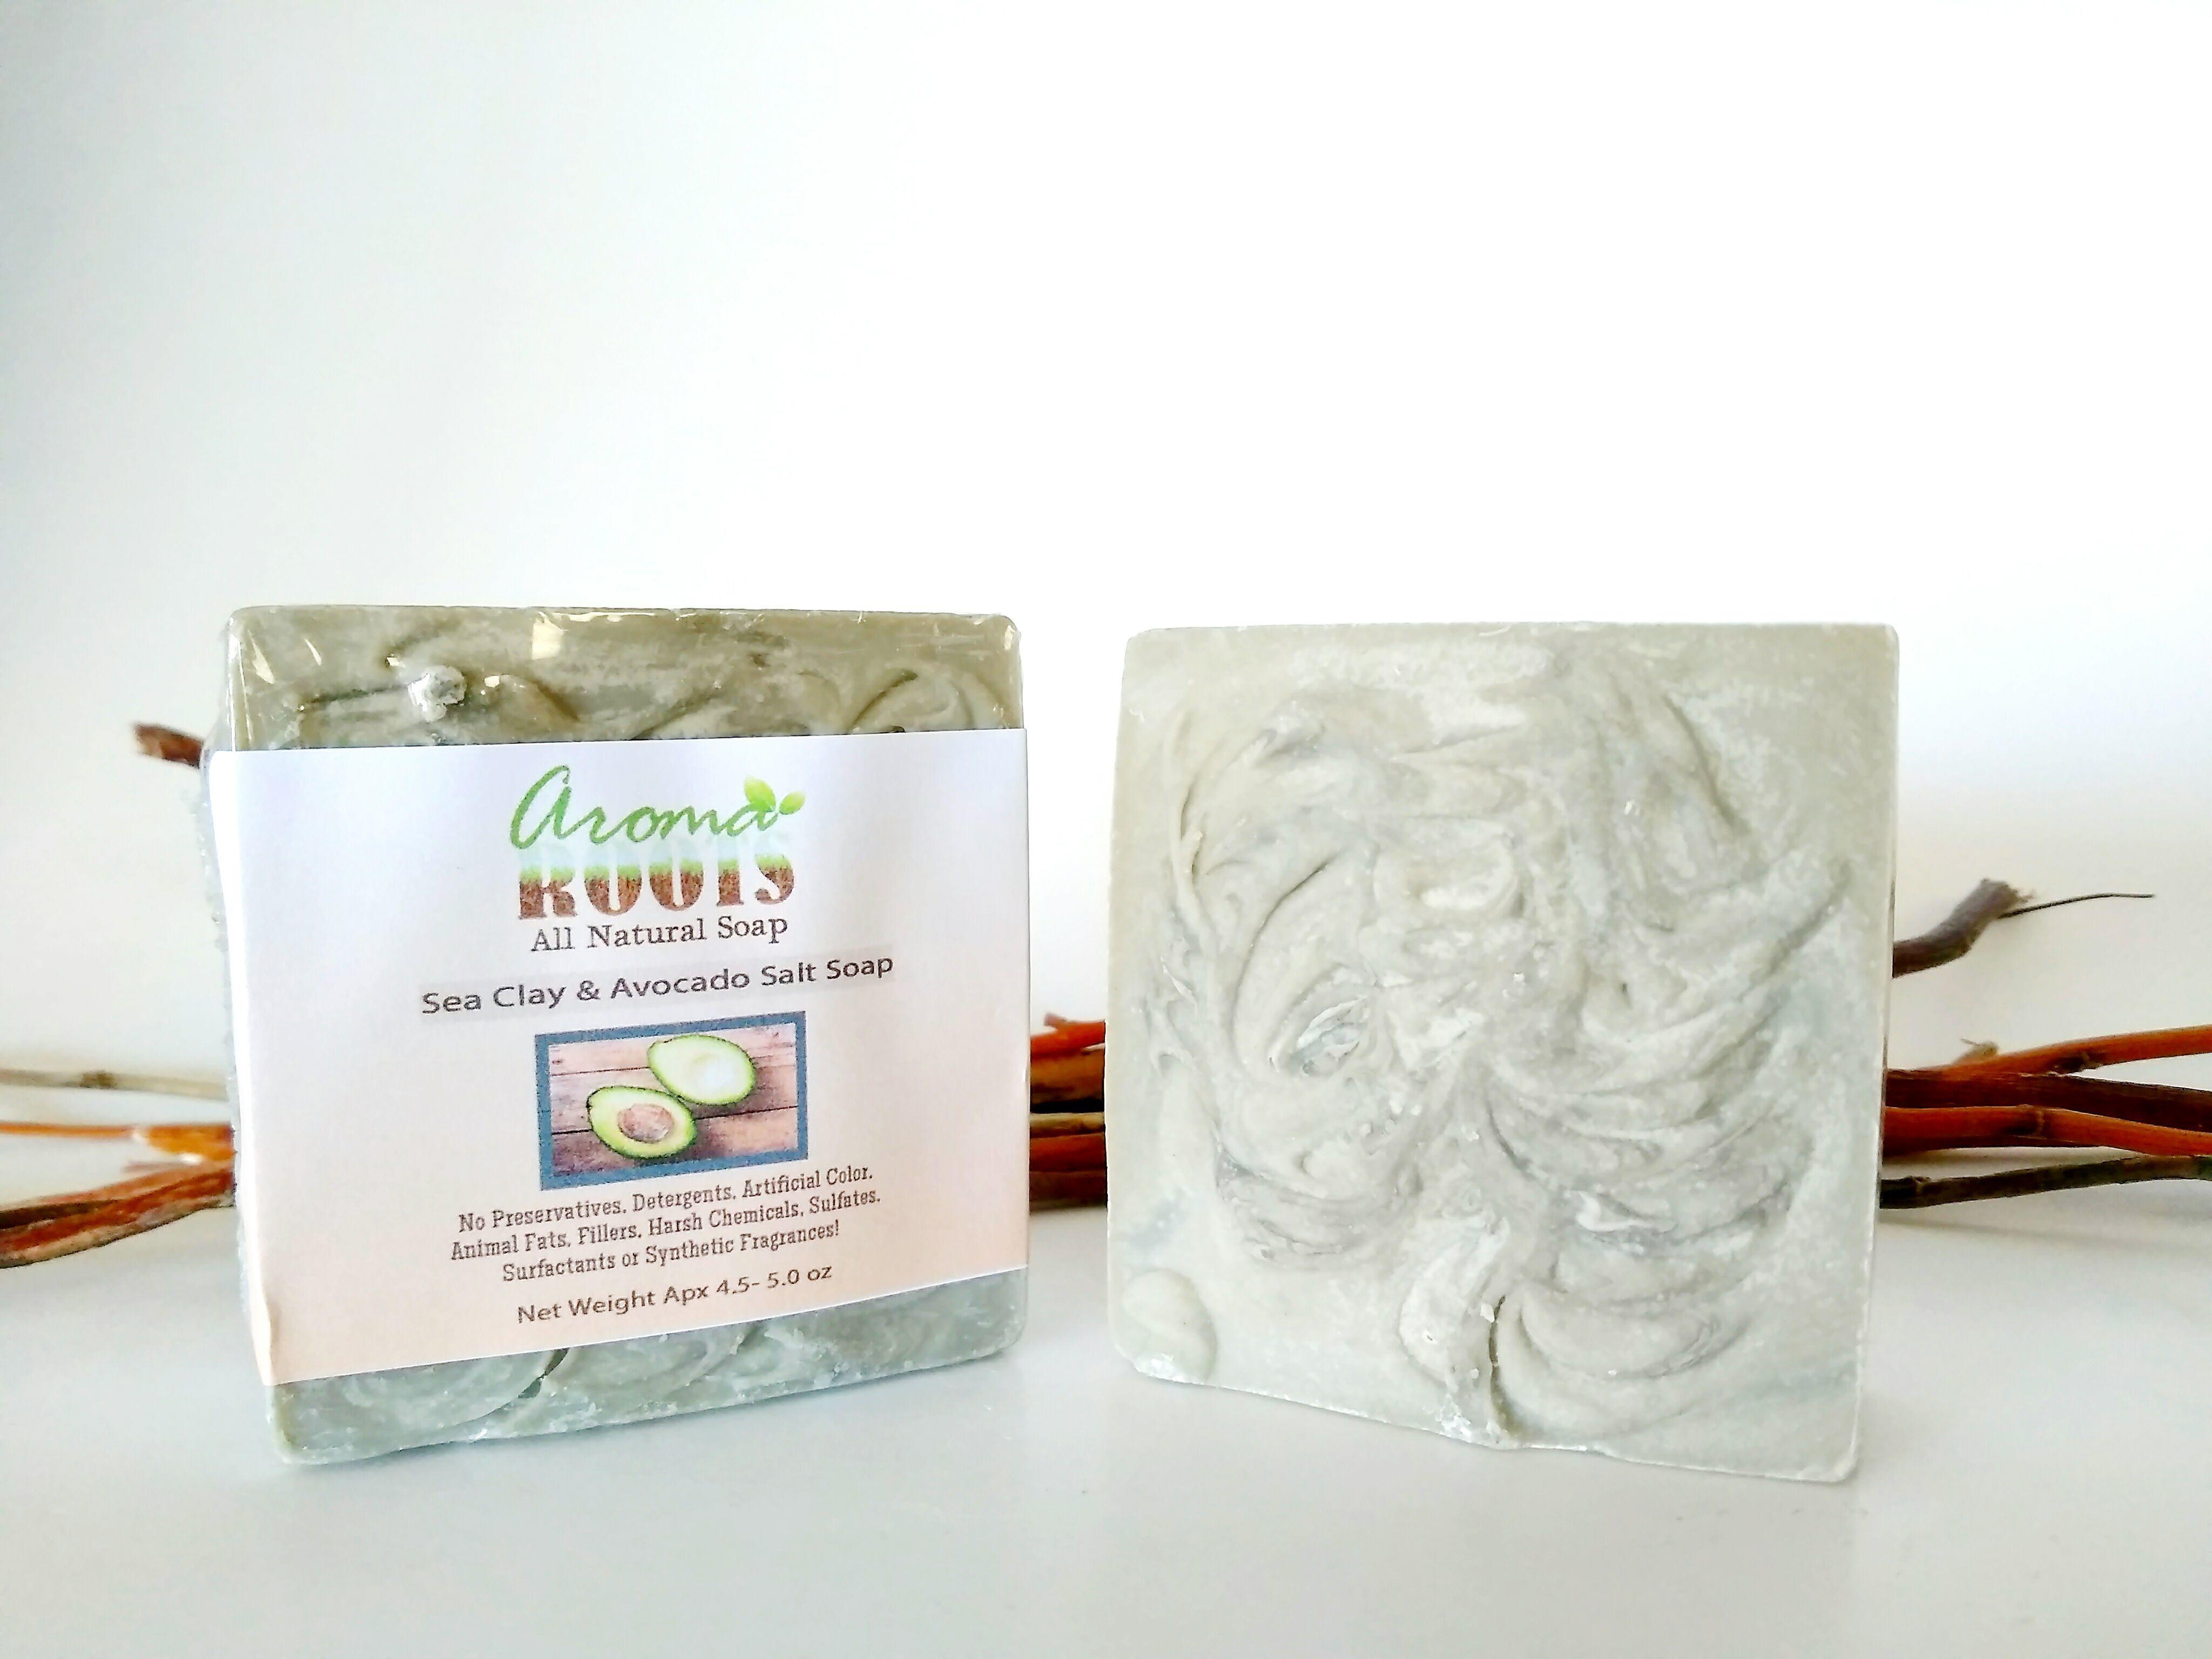 Sea Clay & Avocado Salt Bar 717880860340